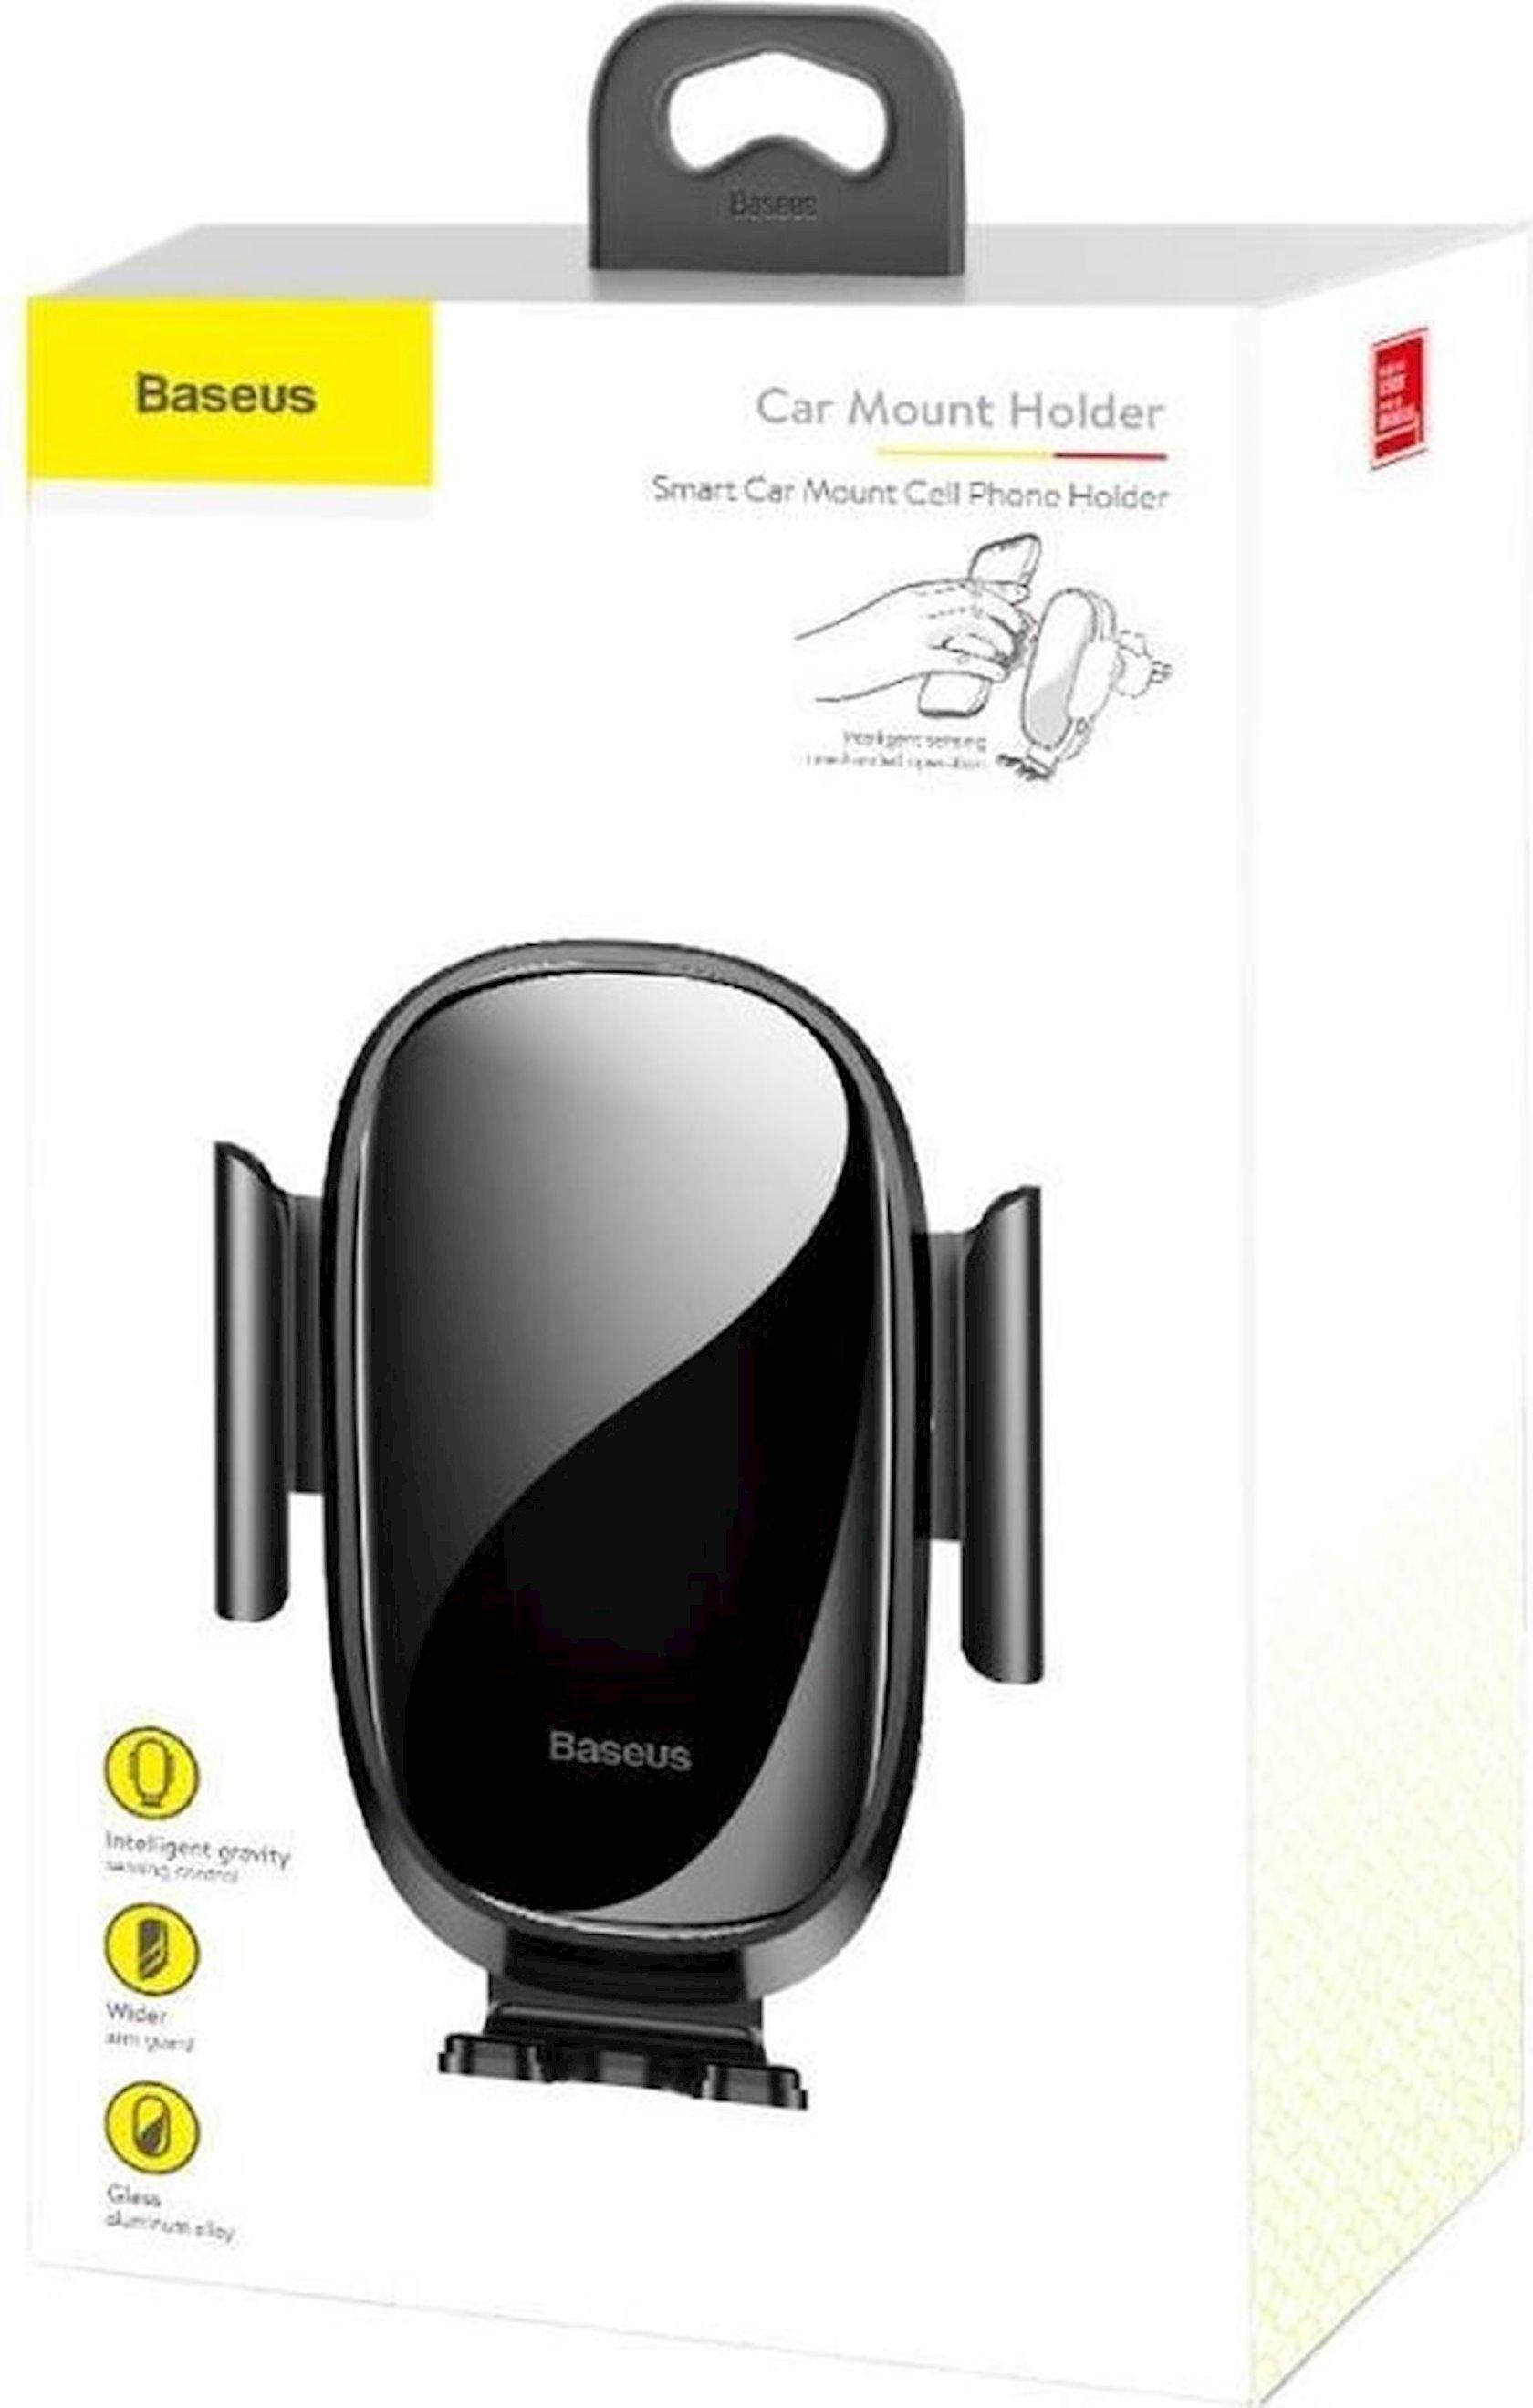 Avtomobil üçün telefon tutucusu Baseus Smart Car Mount Cell, qara